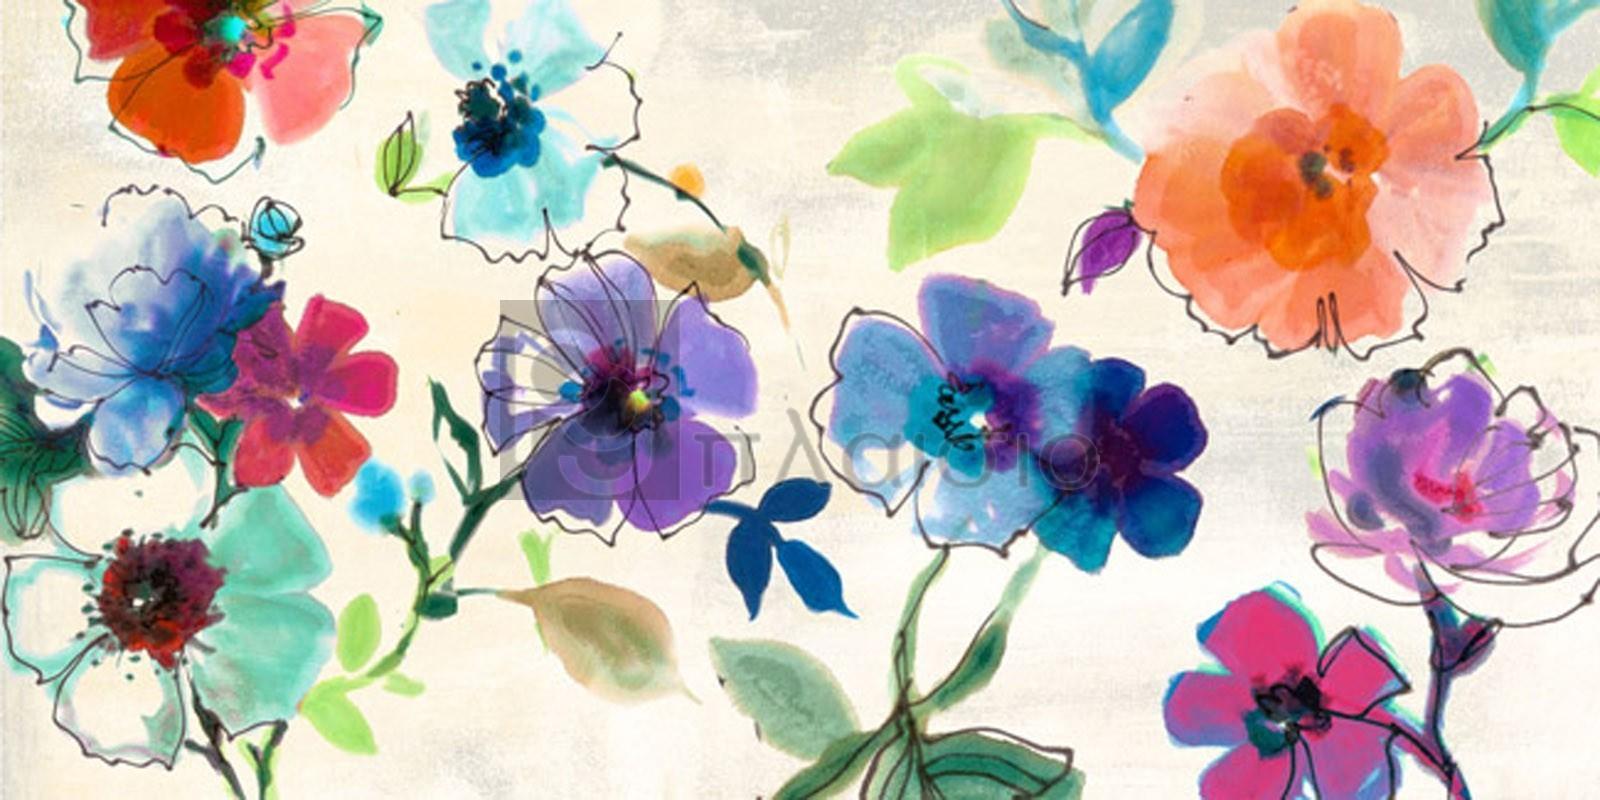 MICHELLE CLAIR - Floral Fantasy